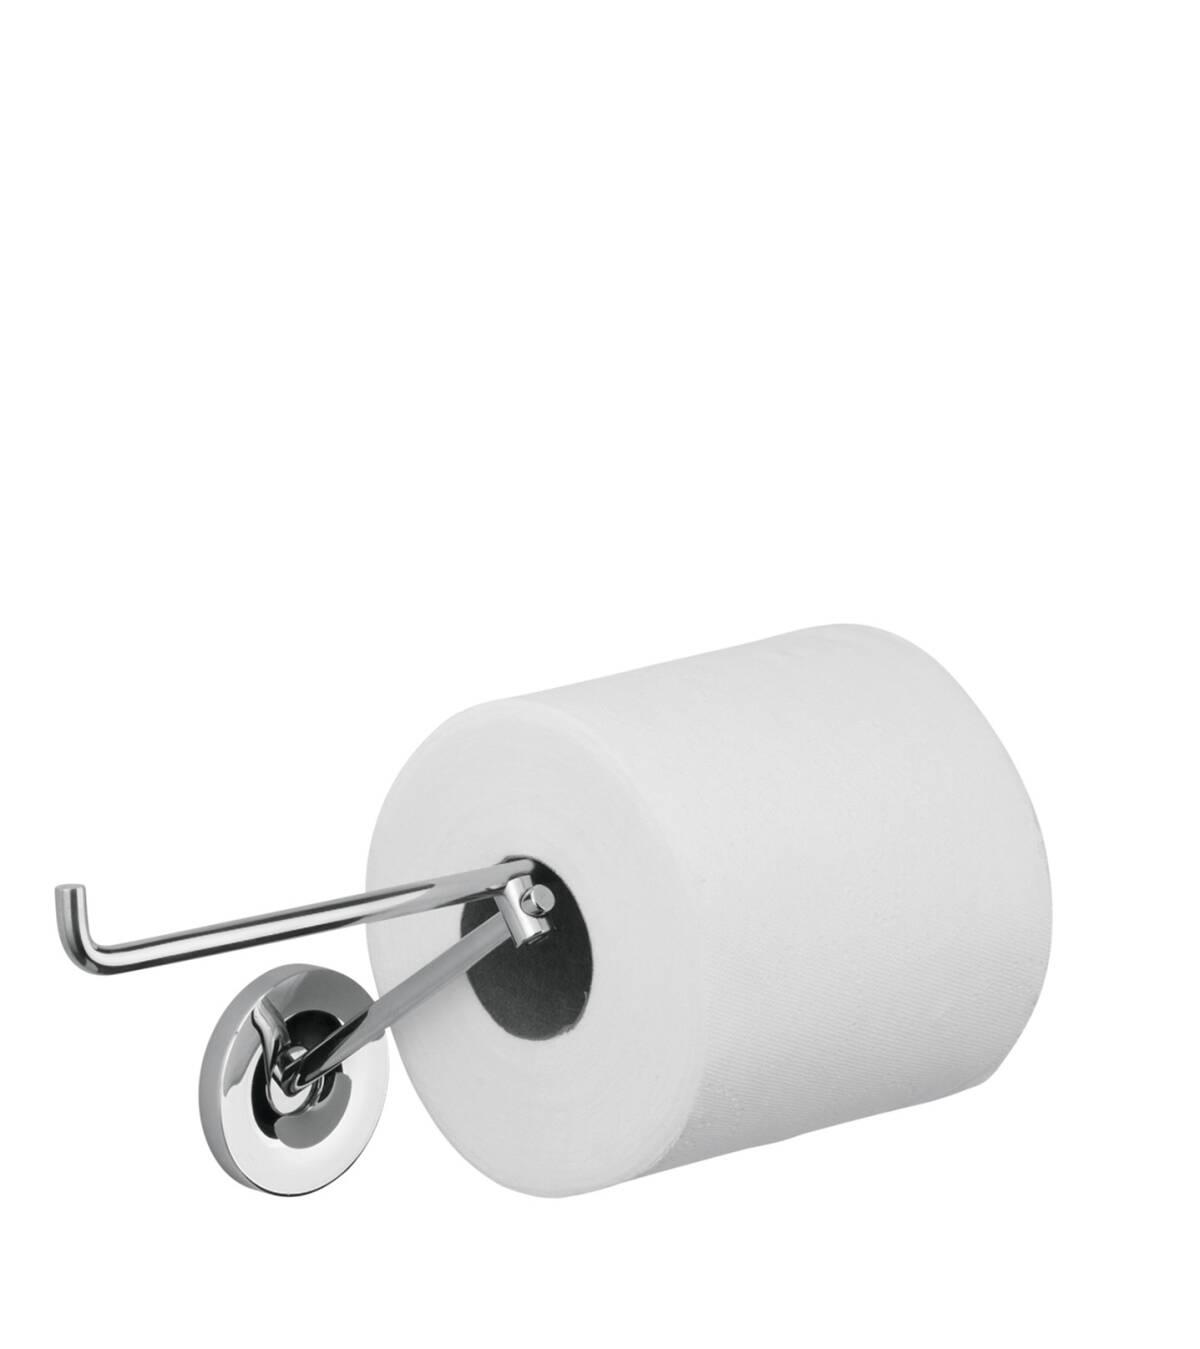 Roll holder, Brushed Chrome, 40836260